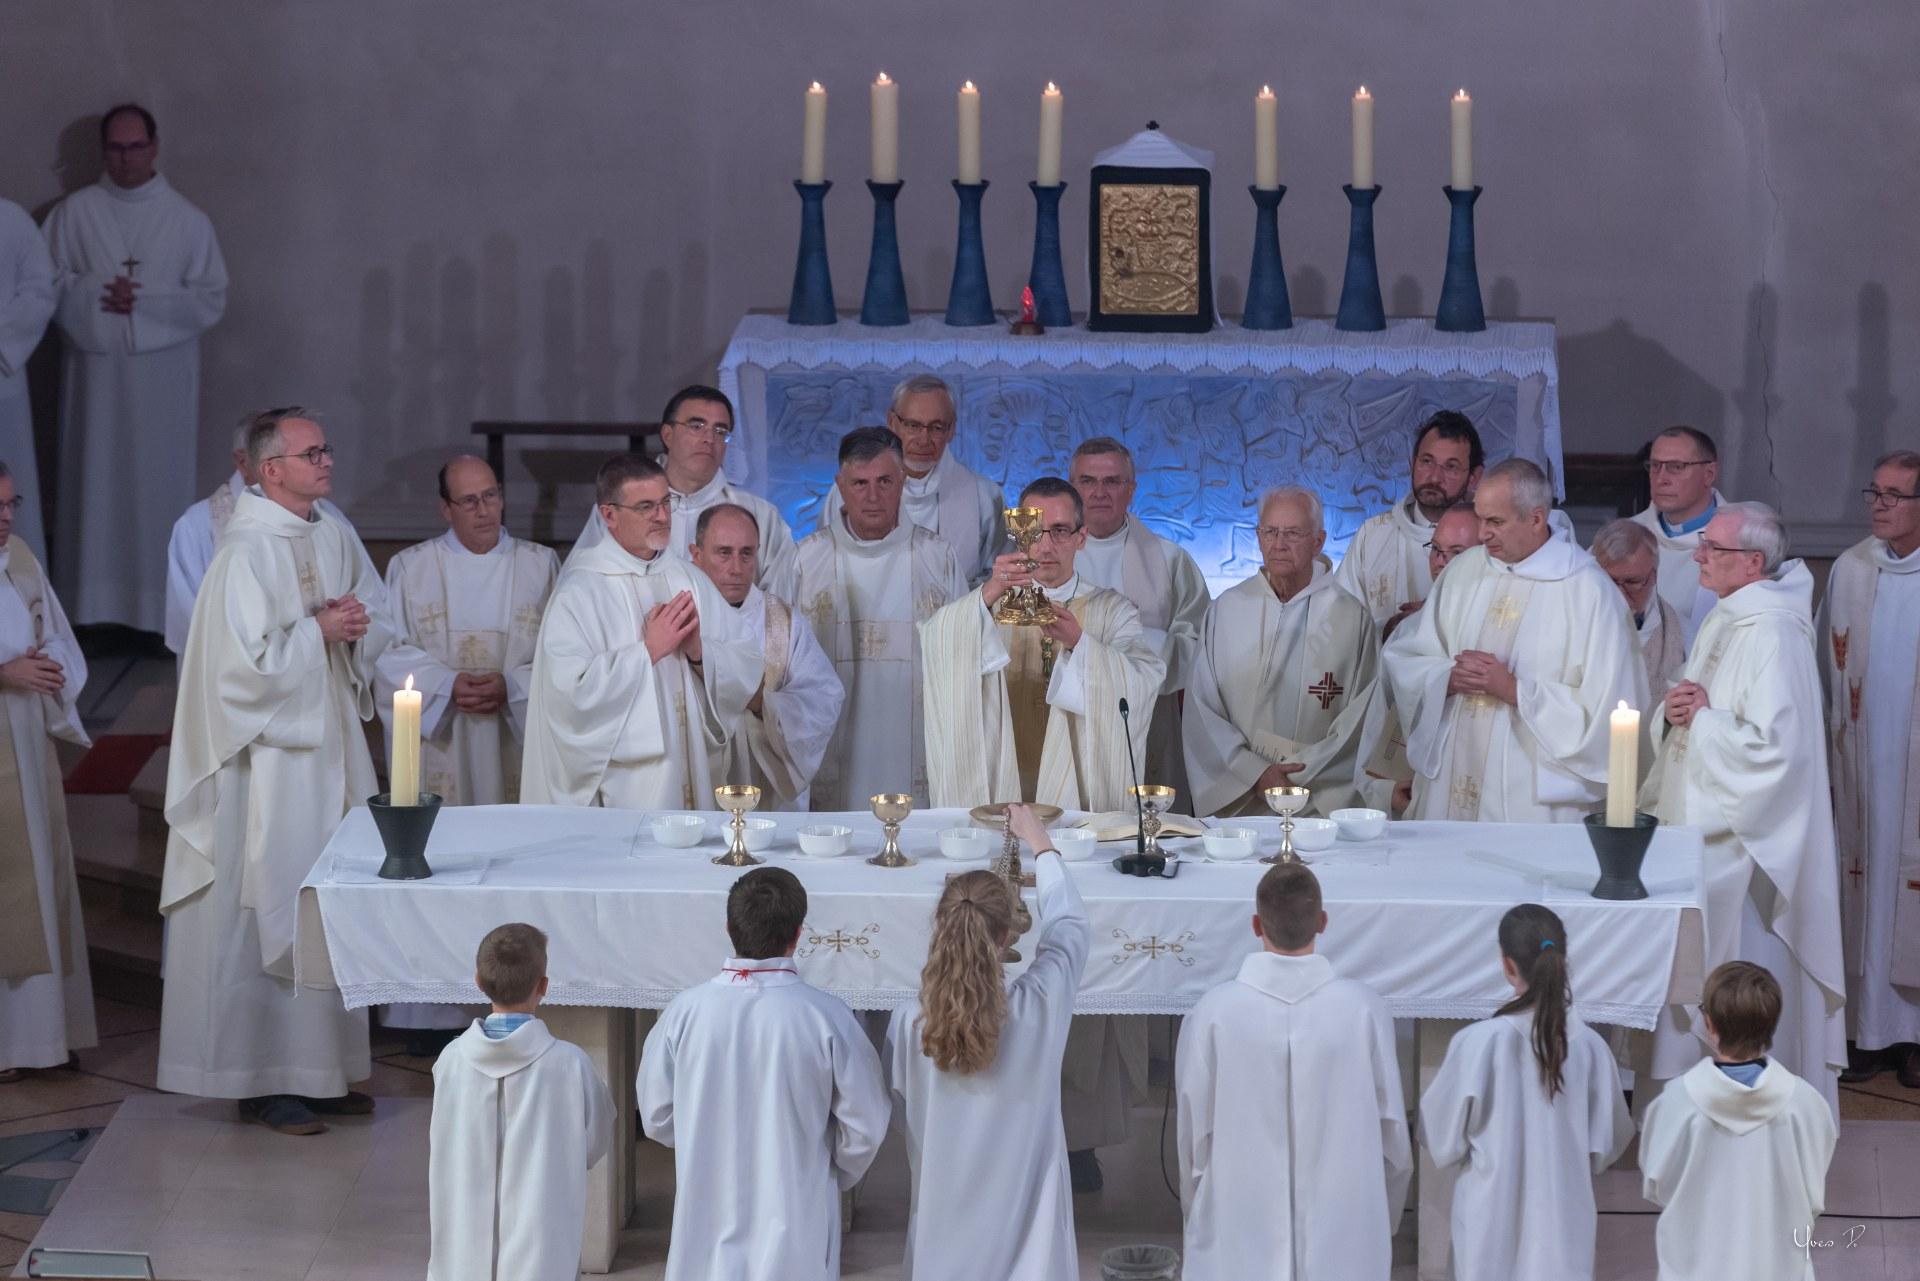 14102018-Felice-Rossi-Ordination diaconale-65891